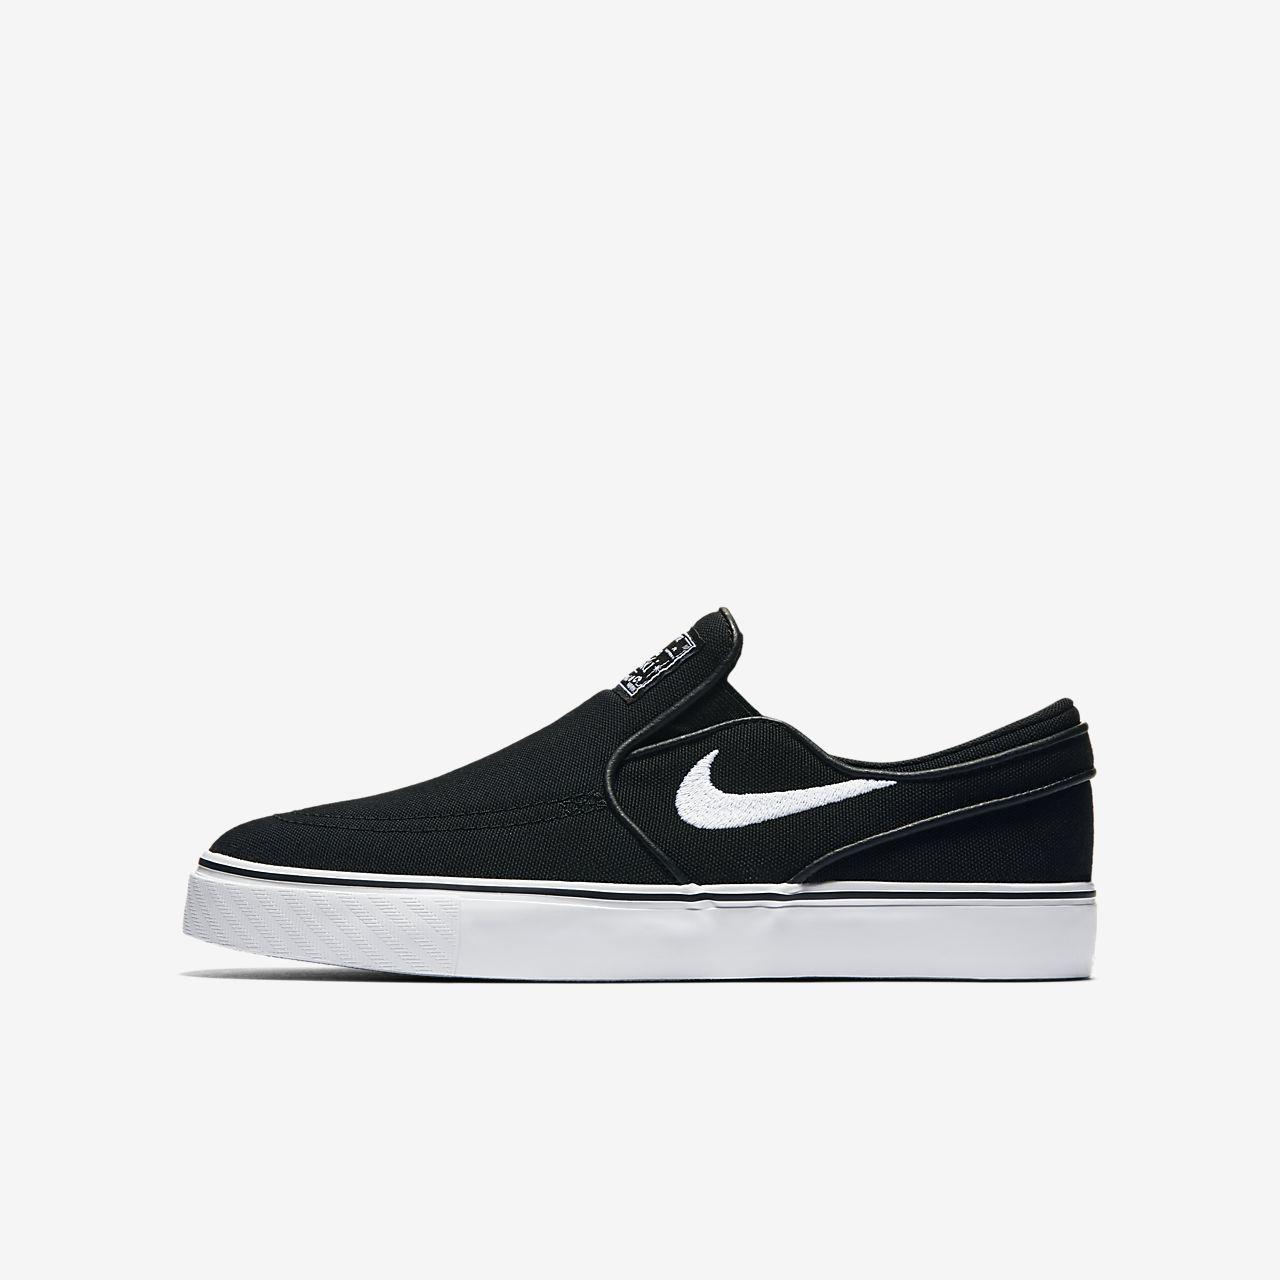 Nike SB Stefan Janoski Canvas Slip-on Older Kids' Skateboarding Shoe